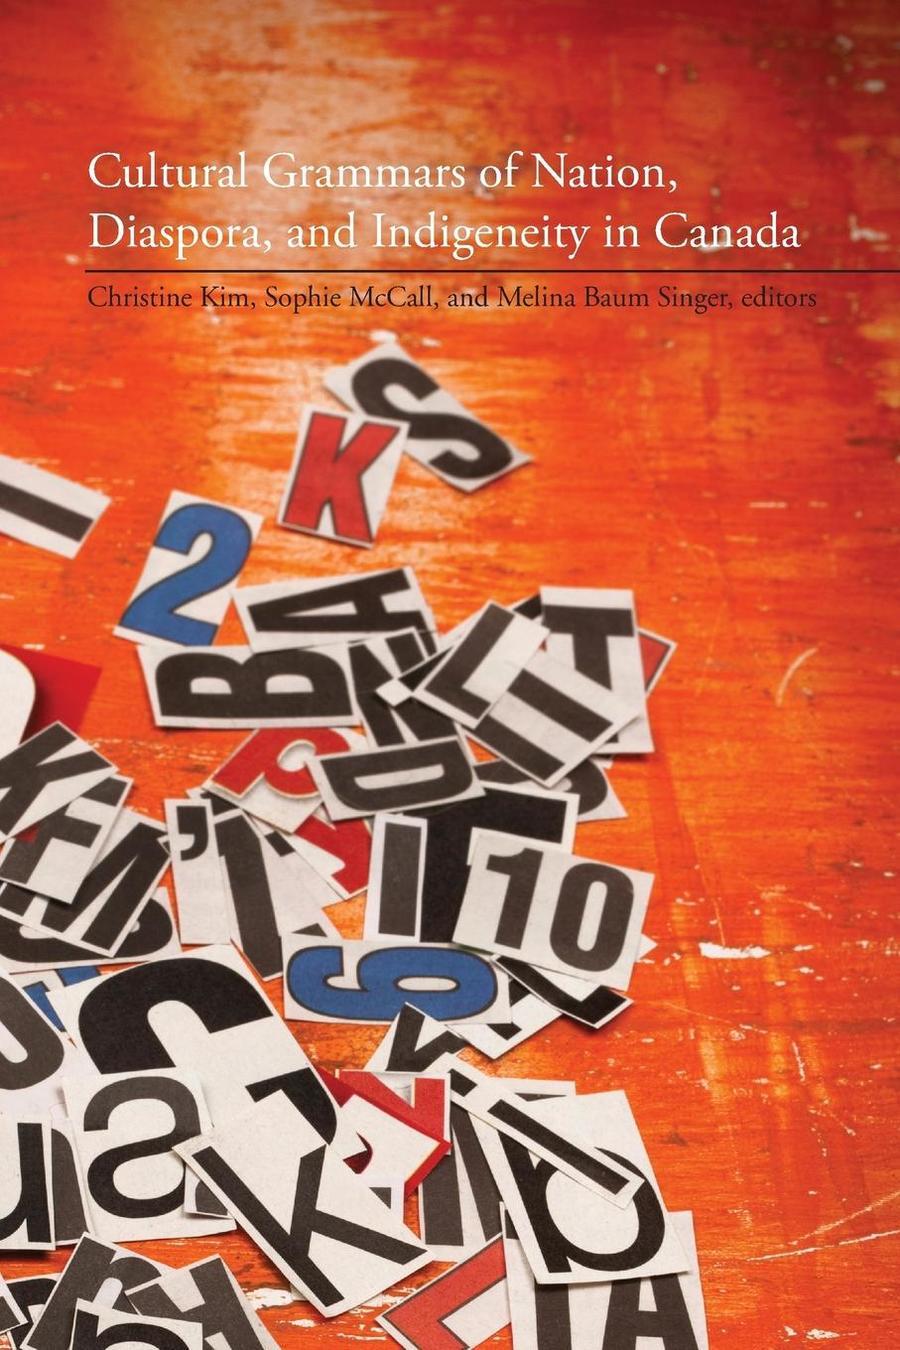 Cultural Grammars of Nation, Diaspora, and Indigeneity in